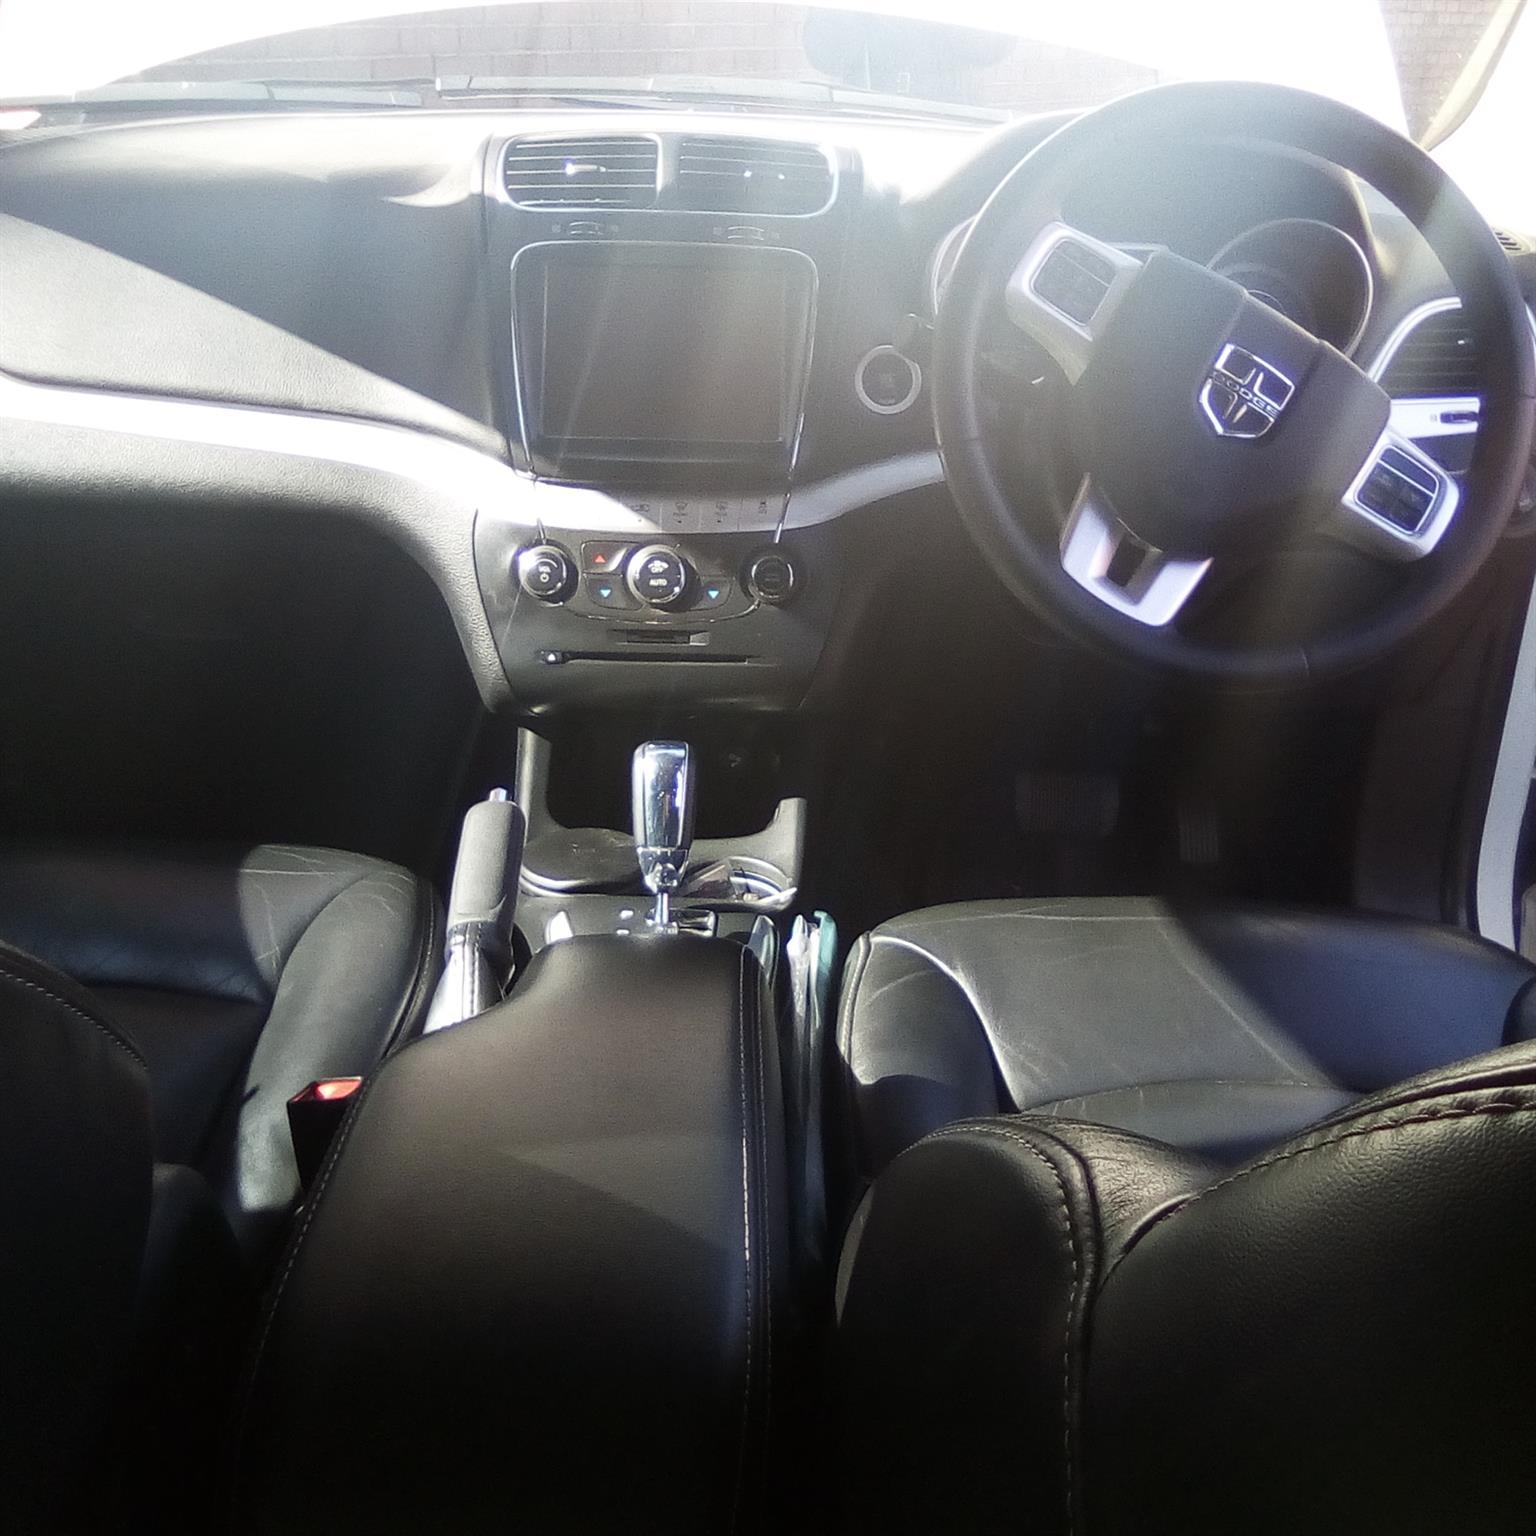 2015 Dodge Journey 3.6 R/T